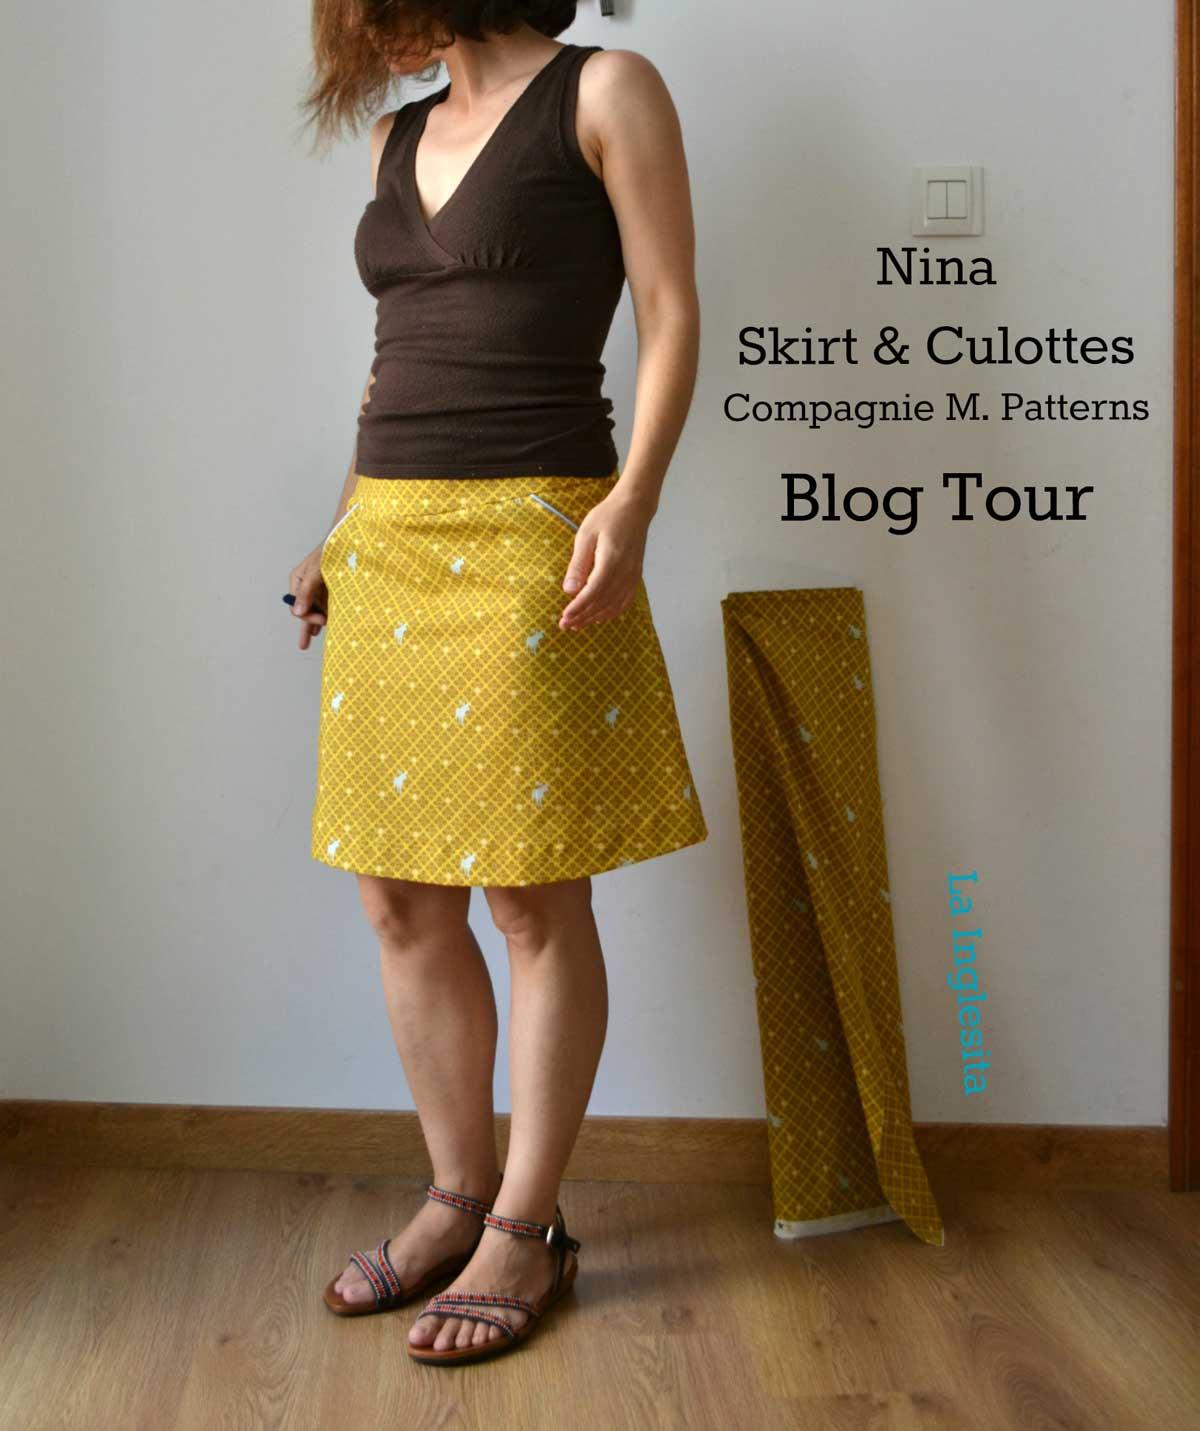 Compagnie-M_Nina_skirt_culottes_la_inglesita